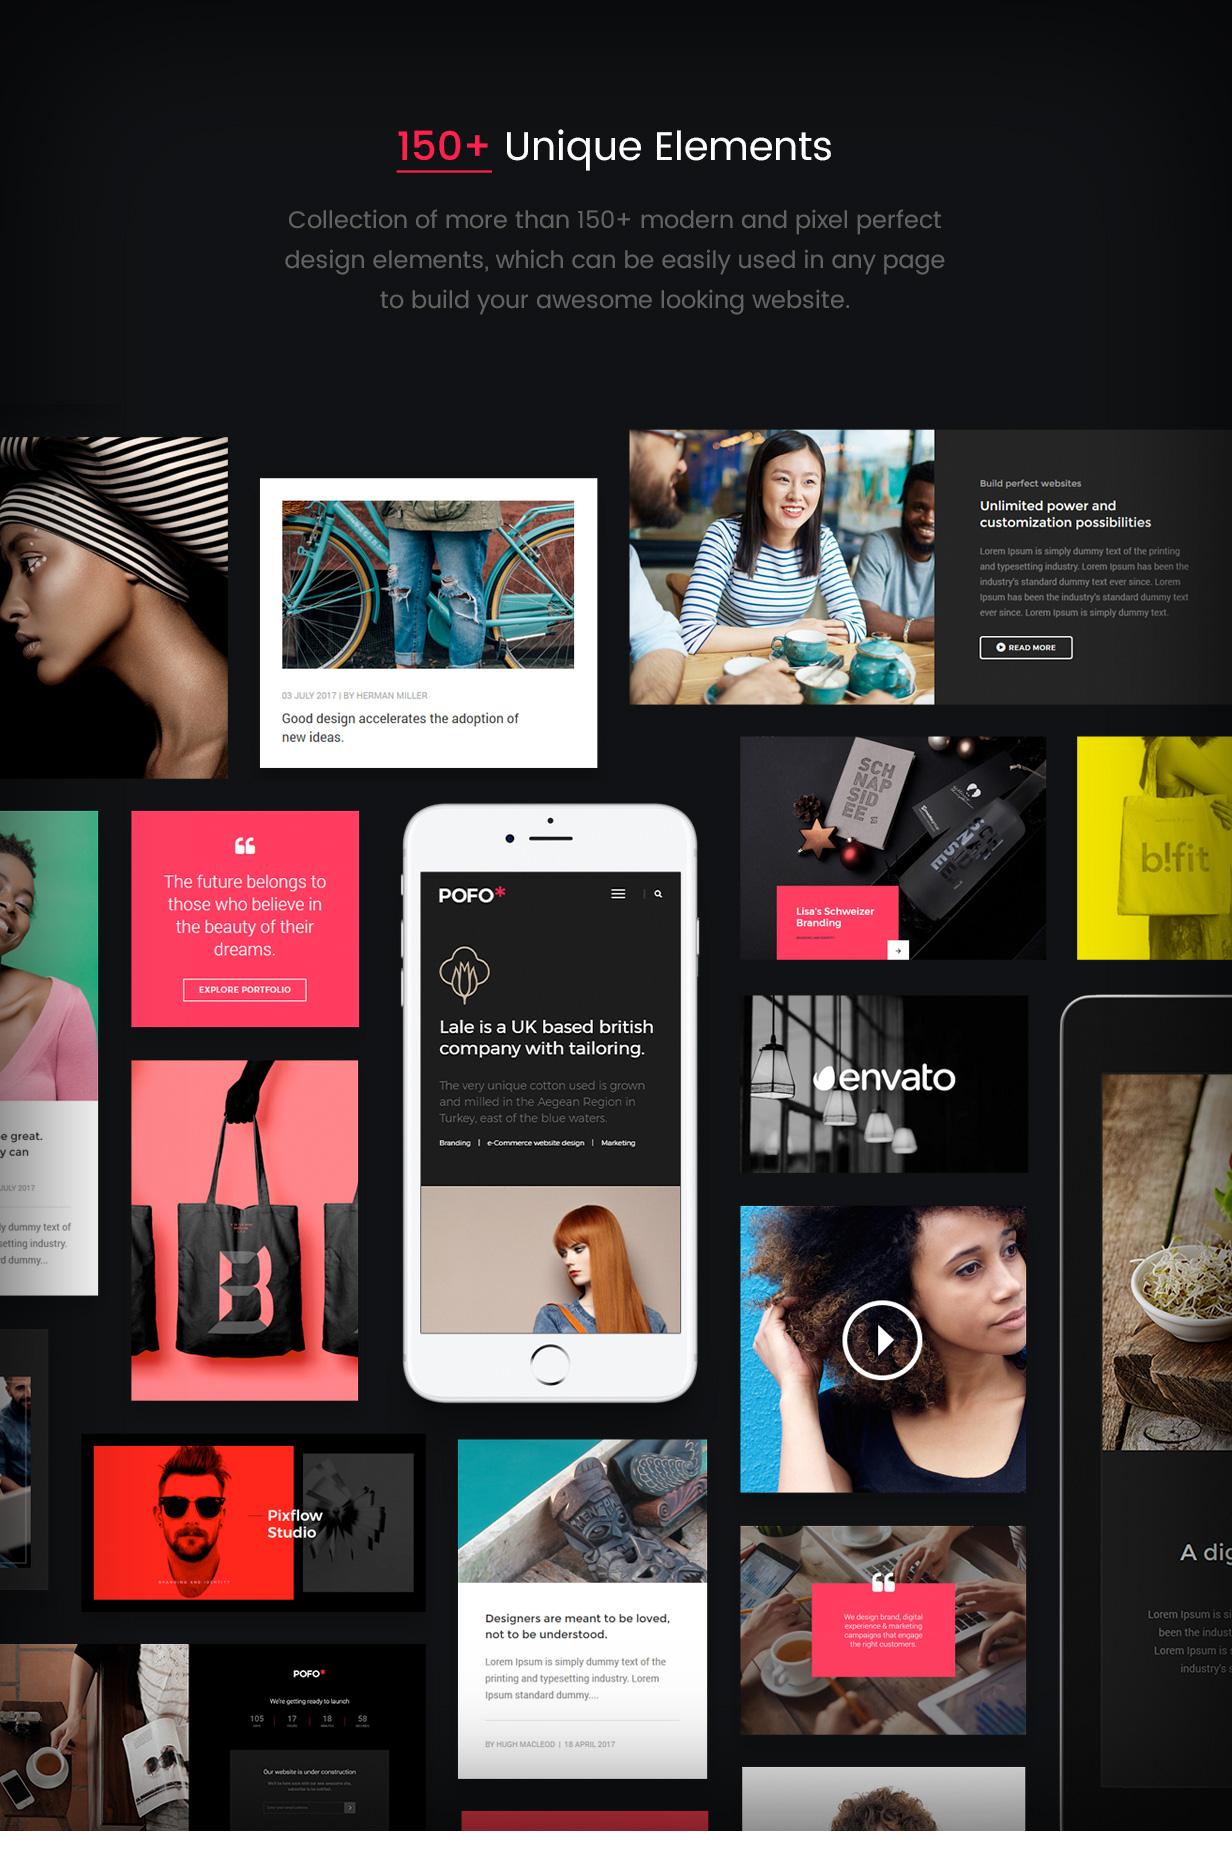 pofo wordpress elements - Pofo - Creative Portfolio and Blog WordPress Theme